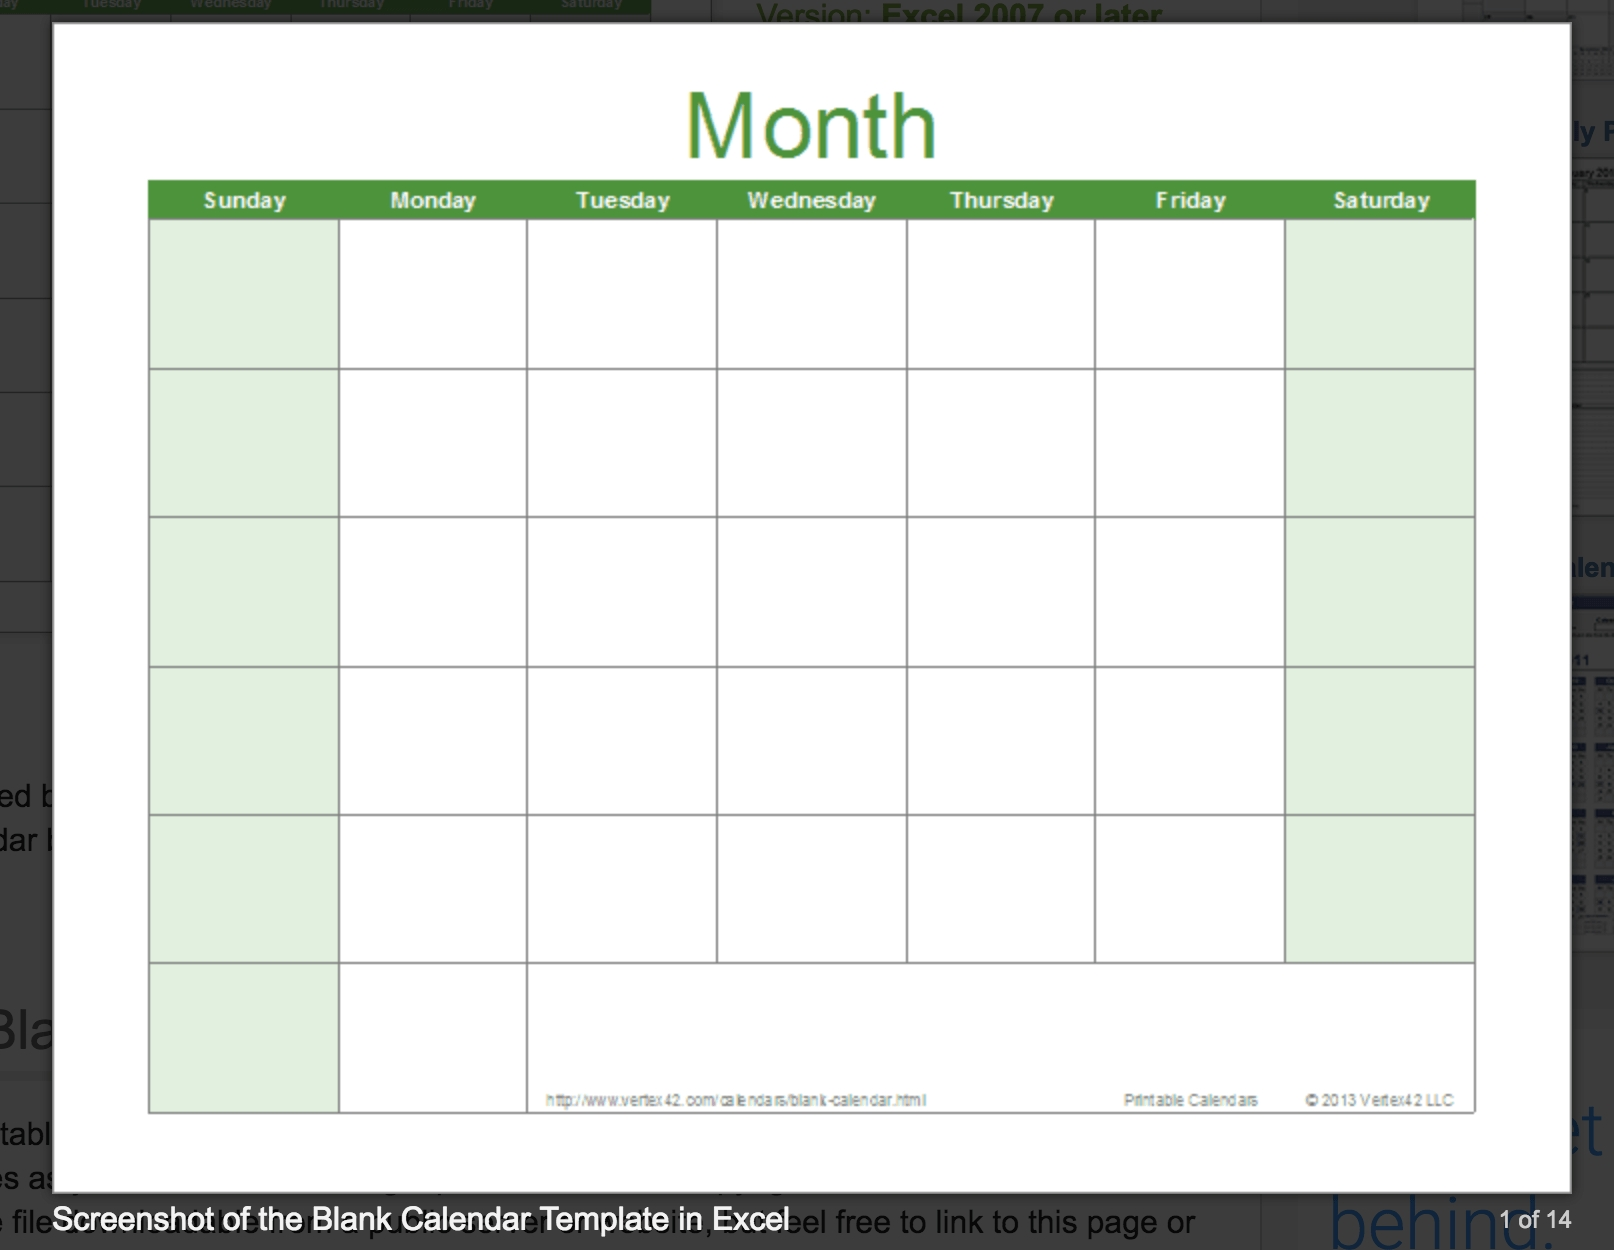 Blank Calendar: Wonderfully Printable 2019 Templates throughout Printable Blank Monthly Calendar With Lines